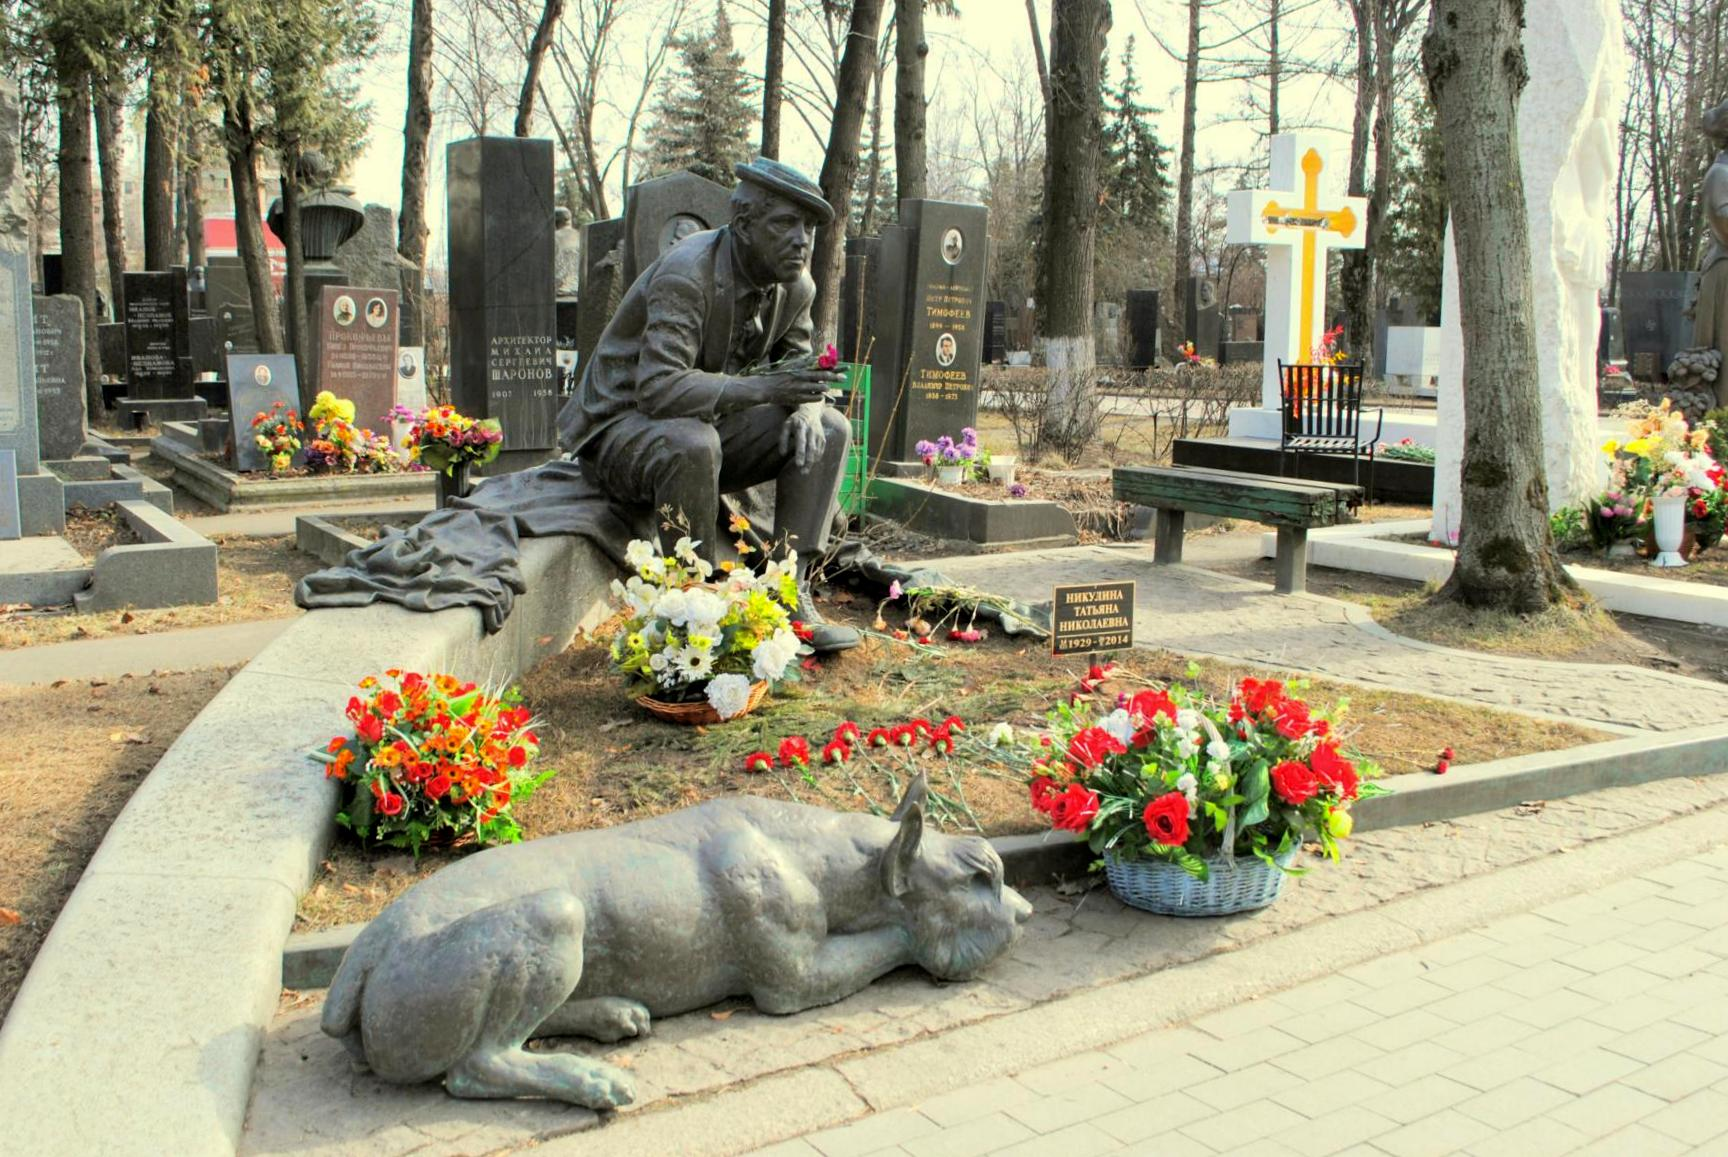 Alegre sepultura de Yuri Nikulin. Cementerio Novodevichy. Moscú 2015.